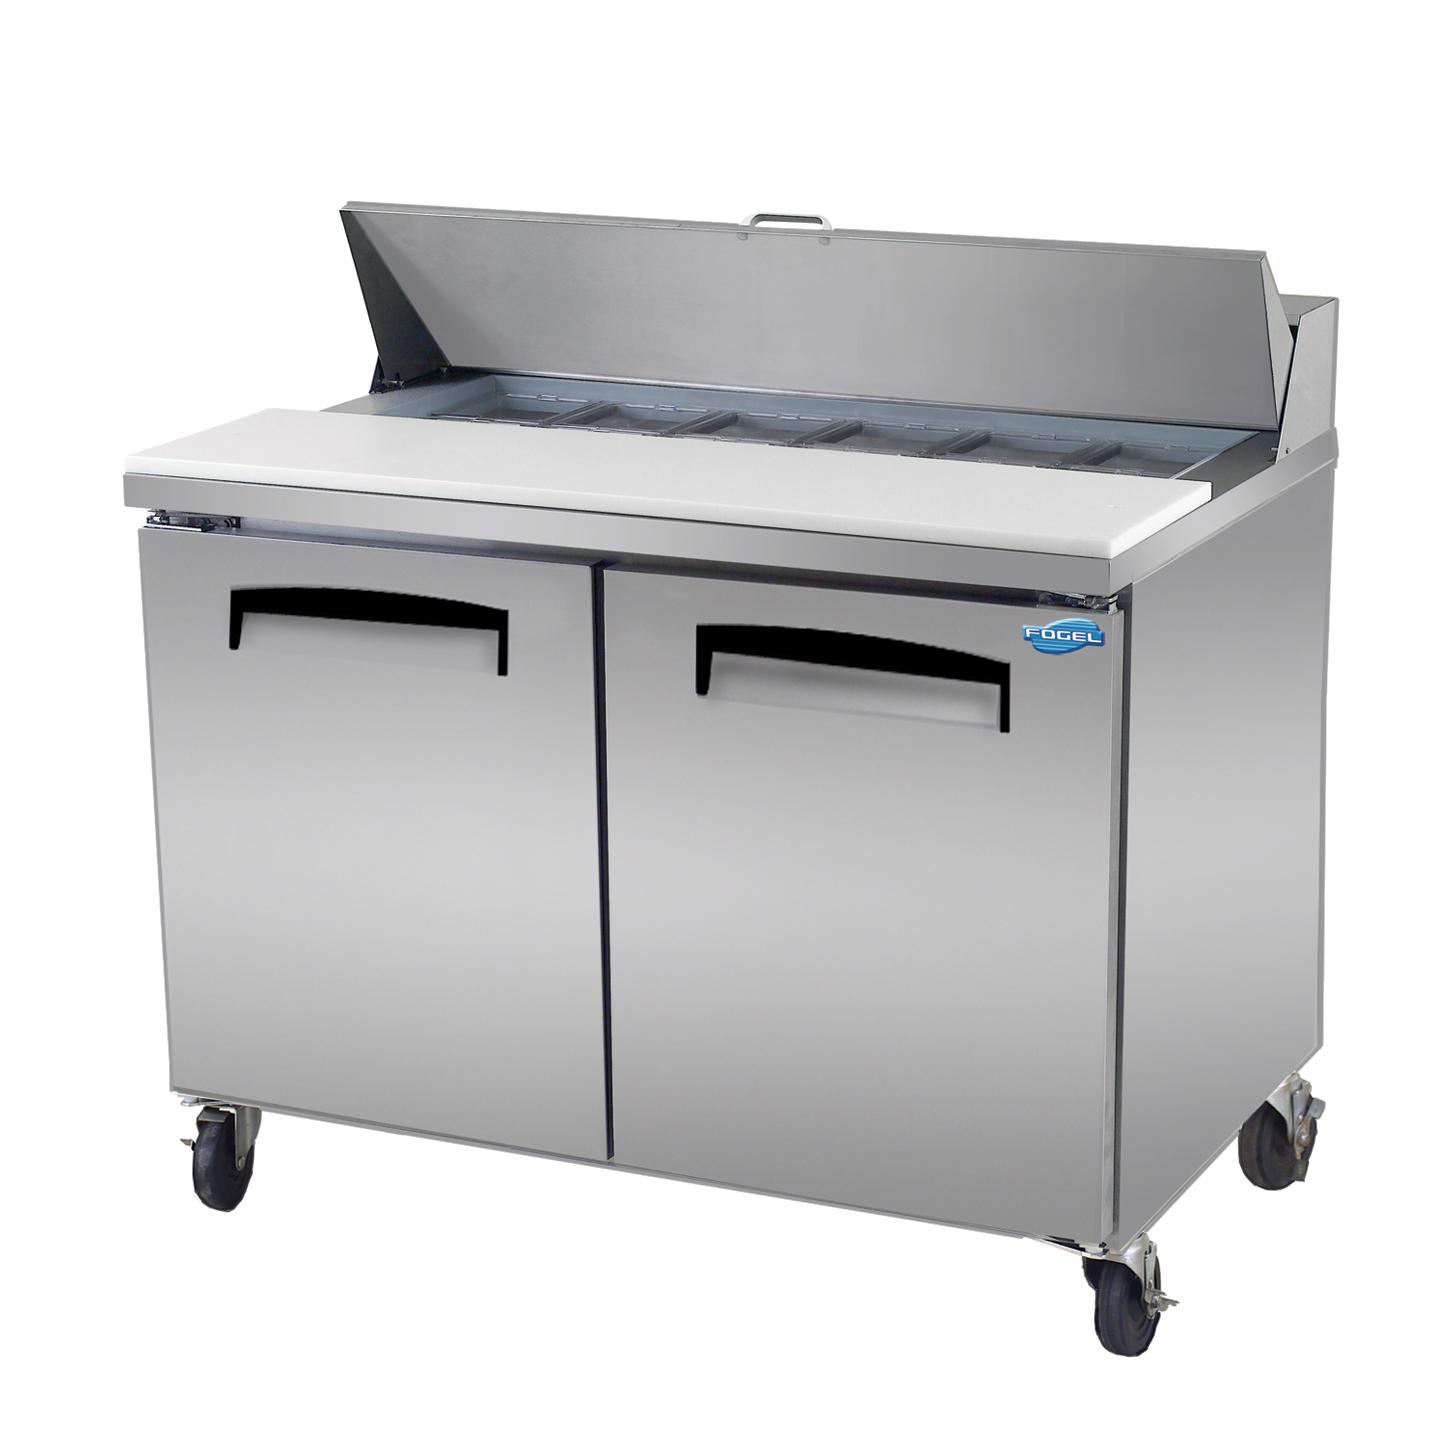 Fogel USA FLP-45-12 refrigerated counter, sandwich / salad unit